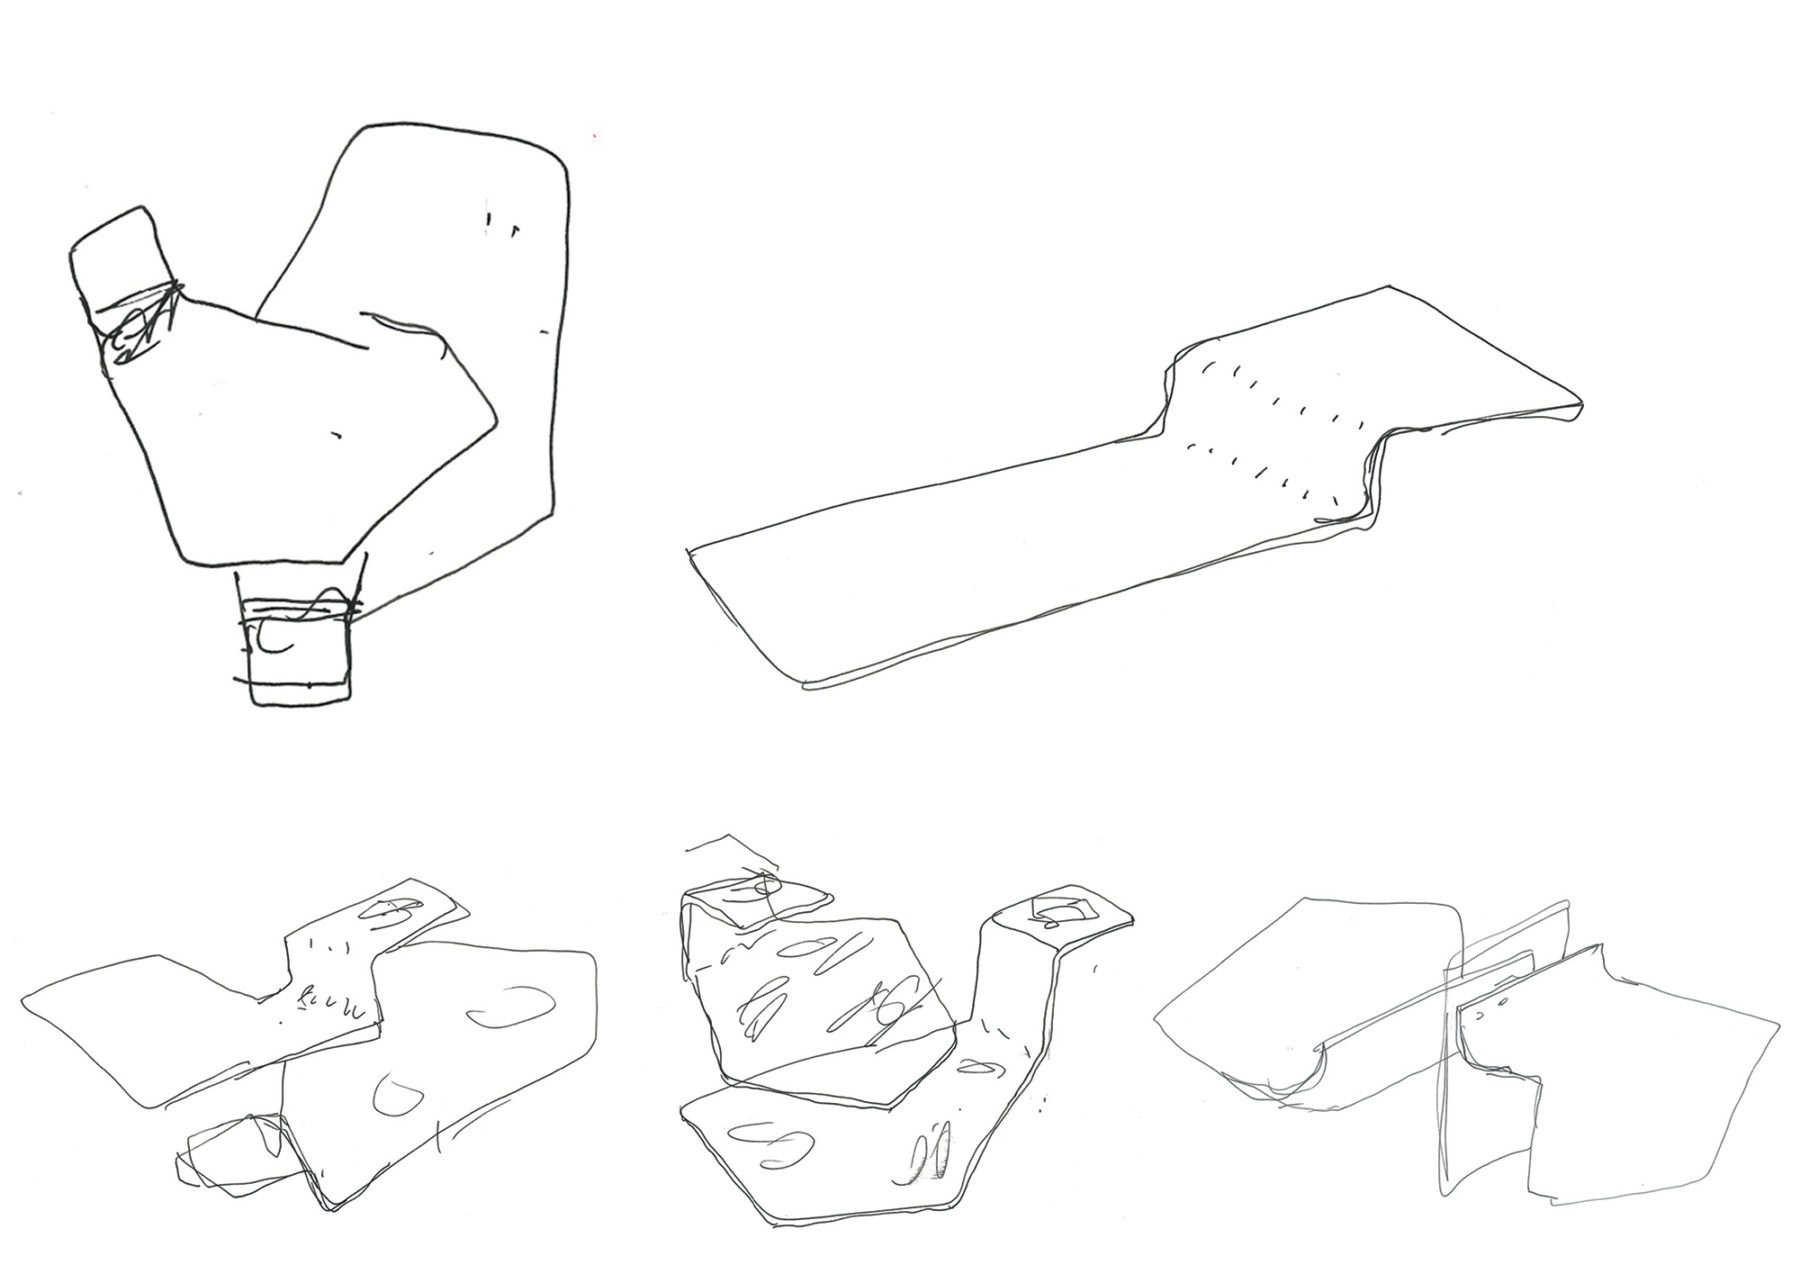 jamie-fobert-architects-selfridges-shoe-galleries-luxury-retail-concept-gallery-2-sketch